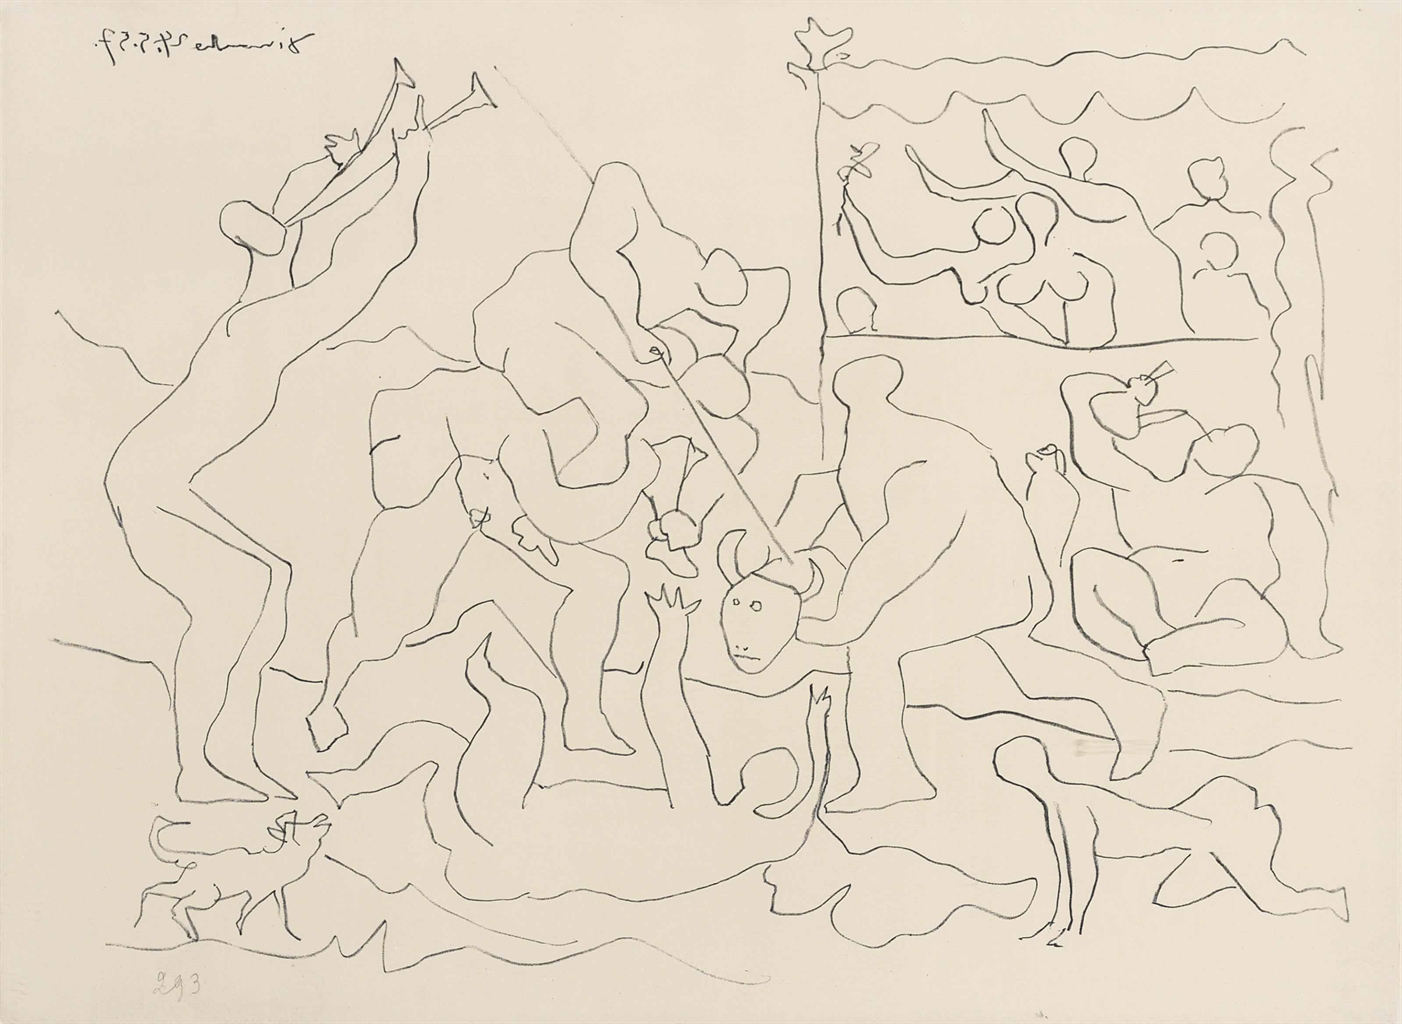 Pablo Picasso-Jeu de la corrida-1957